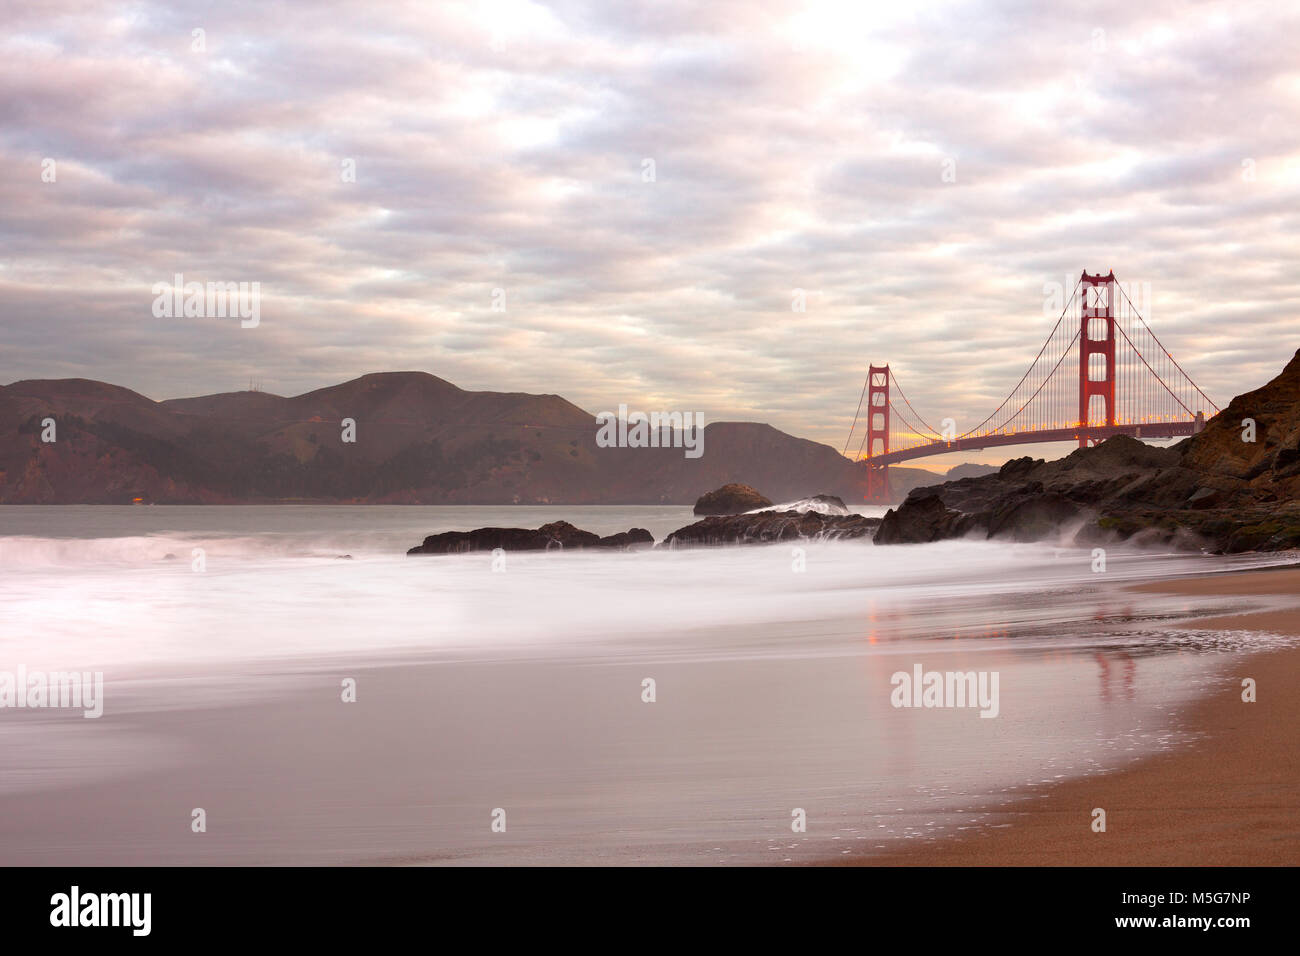 Golden Gate Bridge à partir de Baker Beach, San Francisco, California, USA Photo Stock